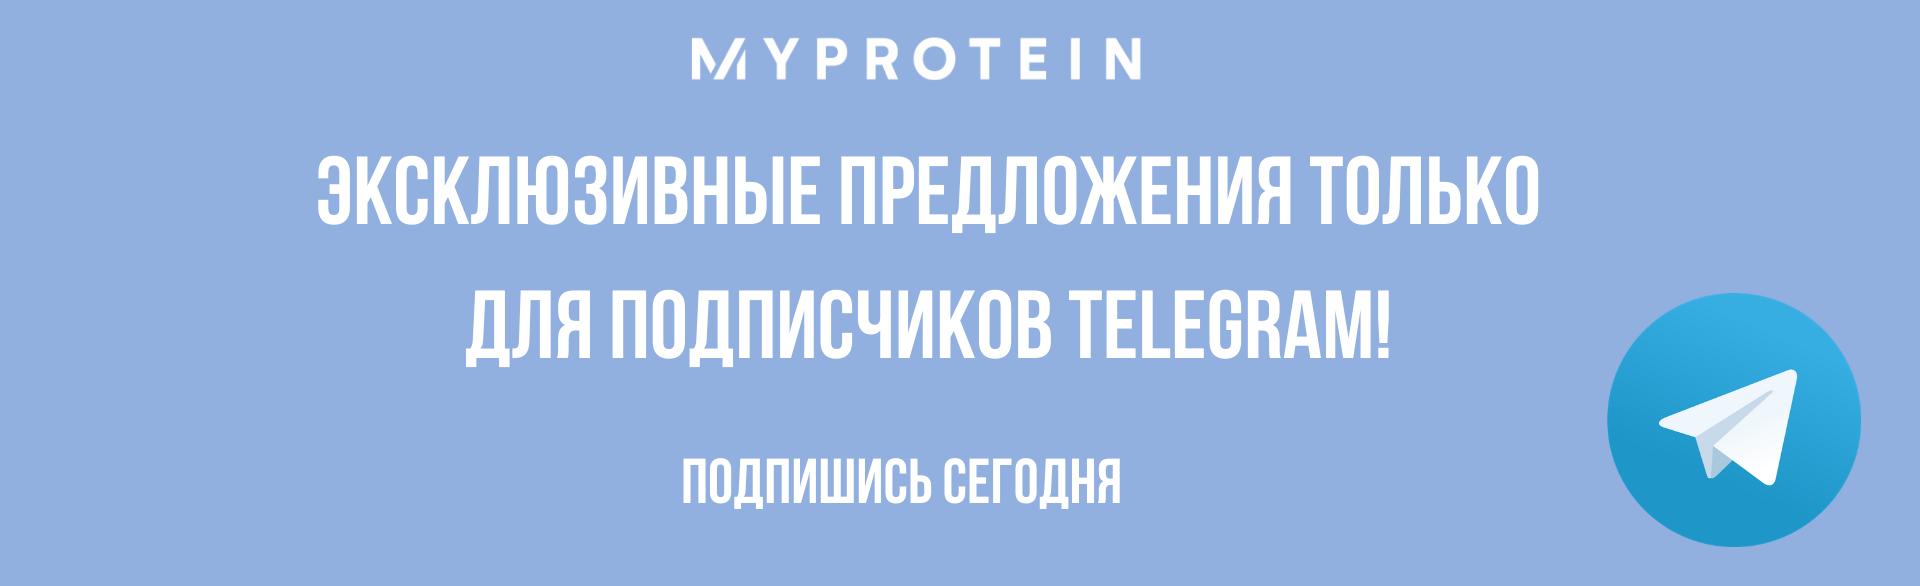 Подпишись на Telegram Myprotein!